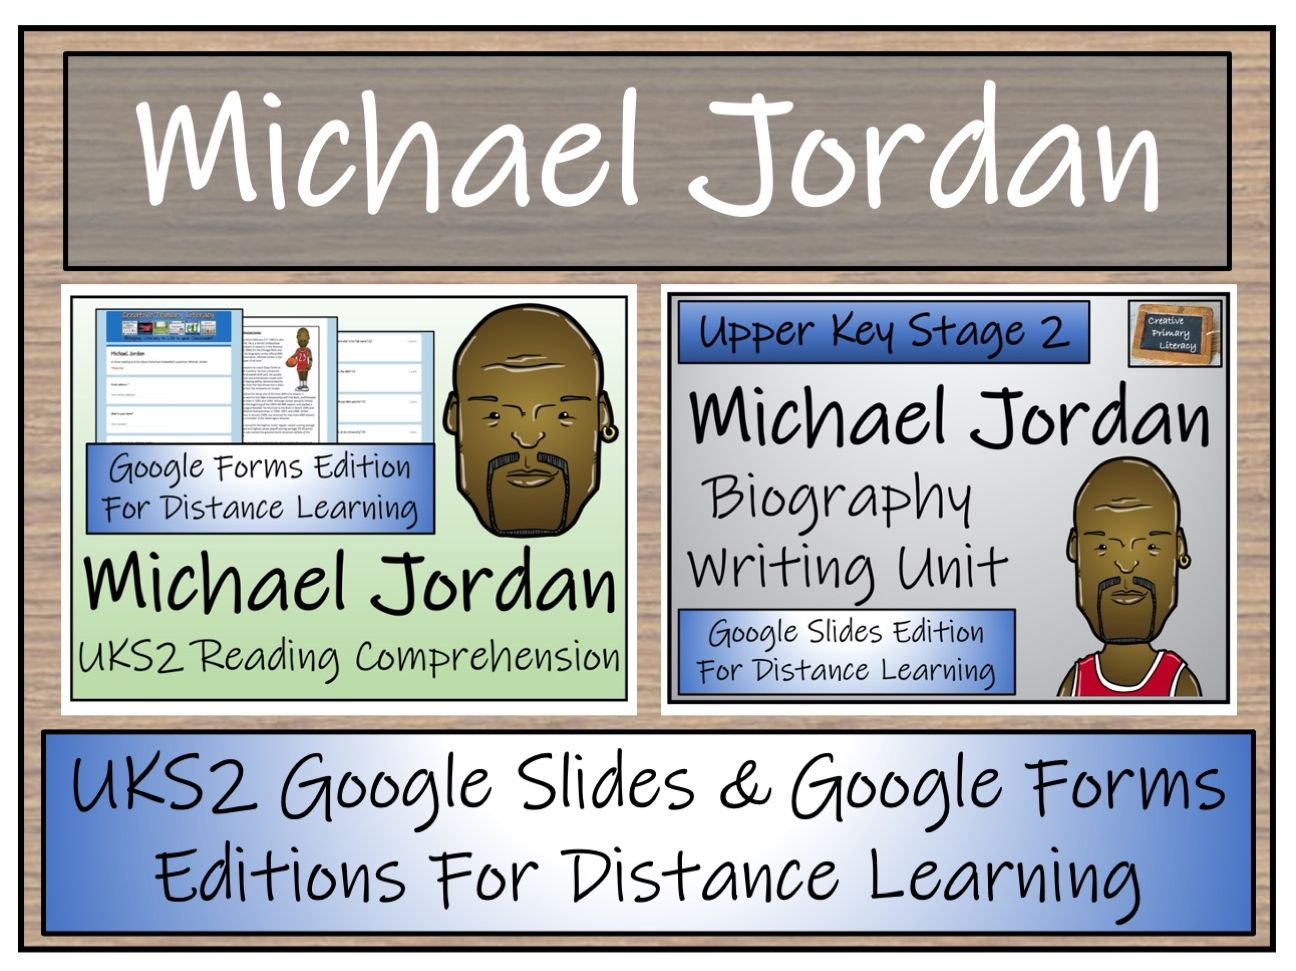 LKS2 Michael Jordan Biography & Reading Comprehension Distance Learning Bundle